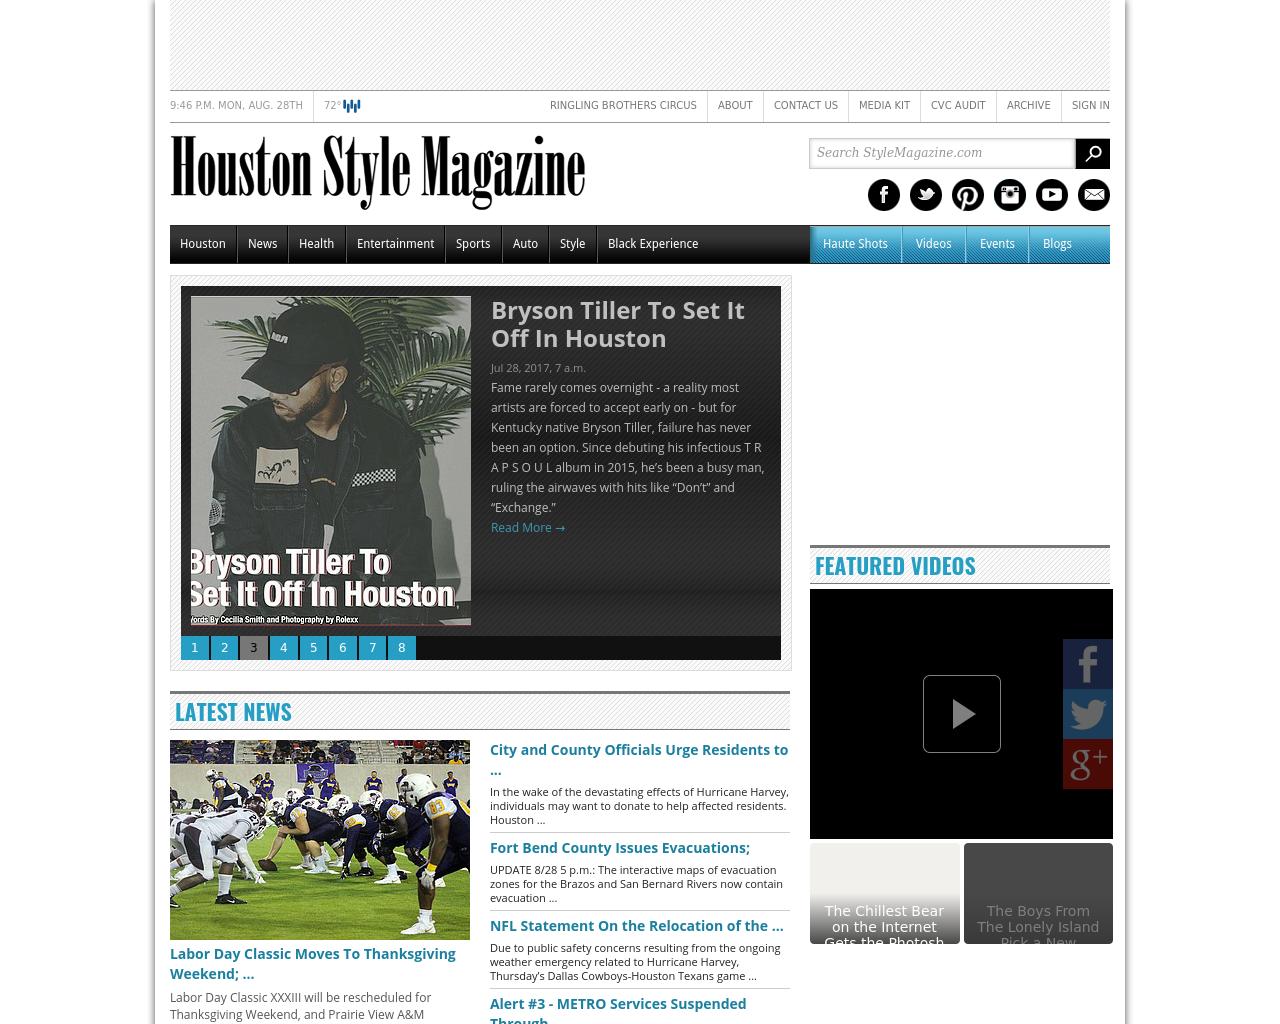 Houston-Style-Magazine-Advertising-Reviews-Pricing